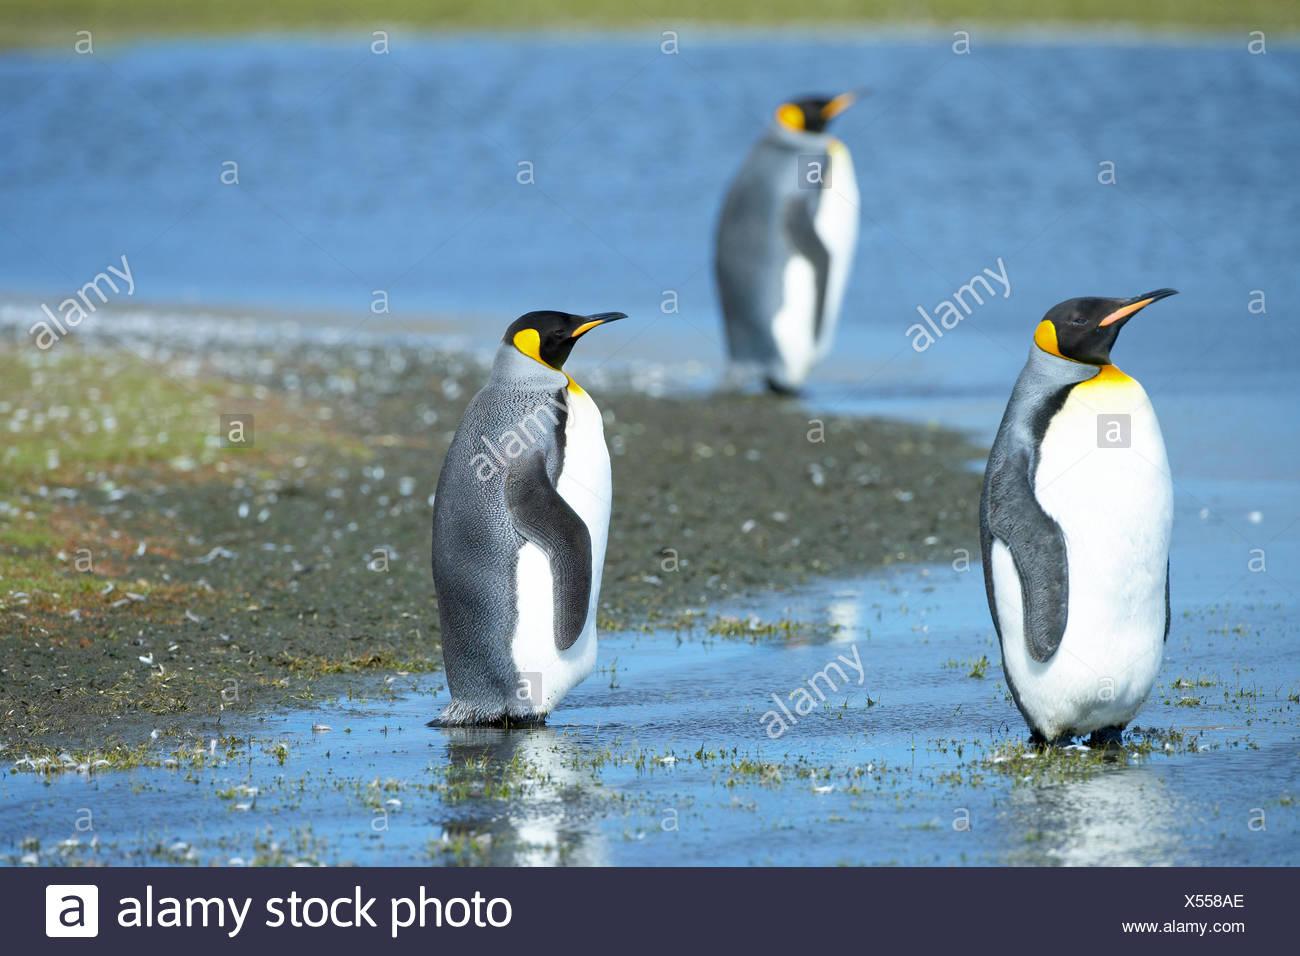 Three King penguins (Aptenodytes patagonicus) standing in water, Volunteer Point, East Falkland, Falkland Islands - Stock Image